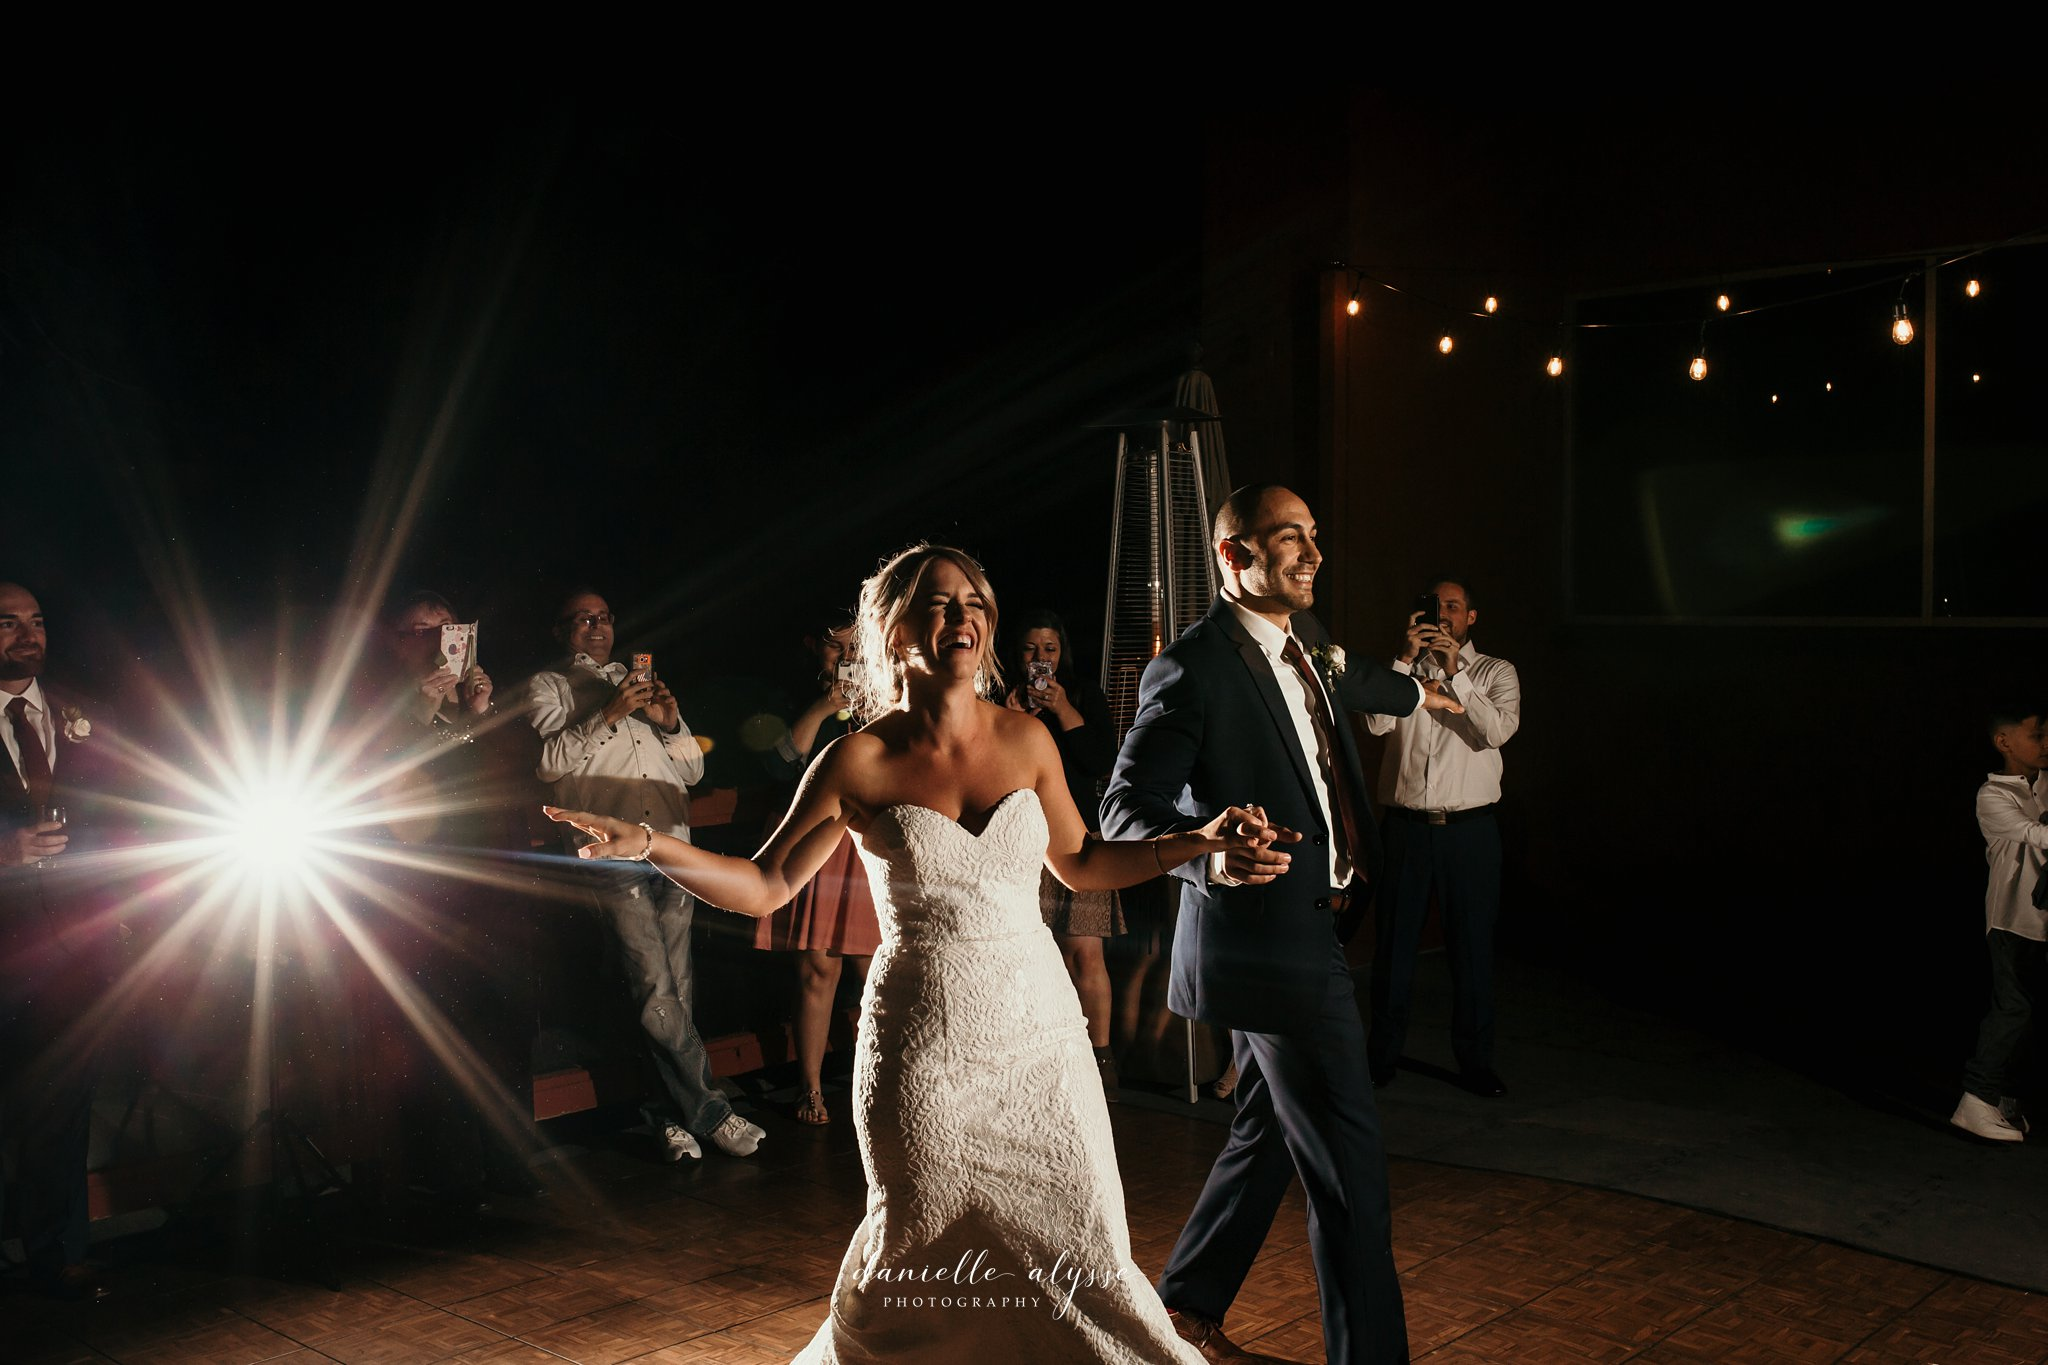 180831_wedding_stephanie_heavenly_south_lake_tahoe_danielle_alysse_photography_destination_blog_1172_WEB.jpg